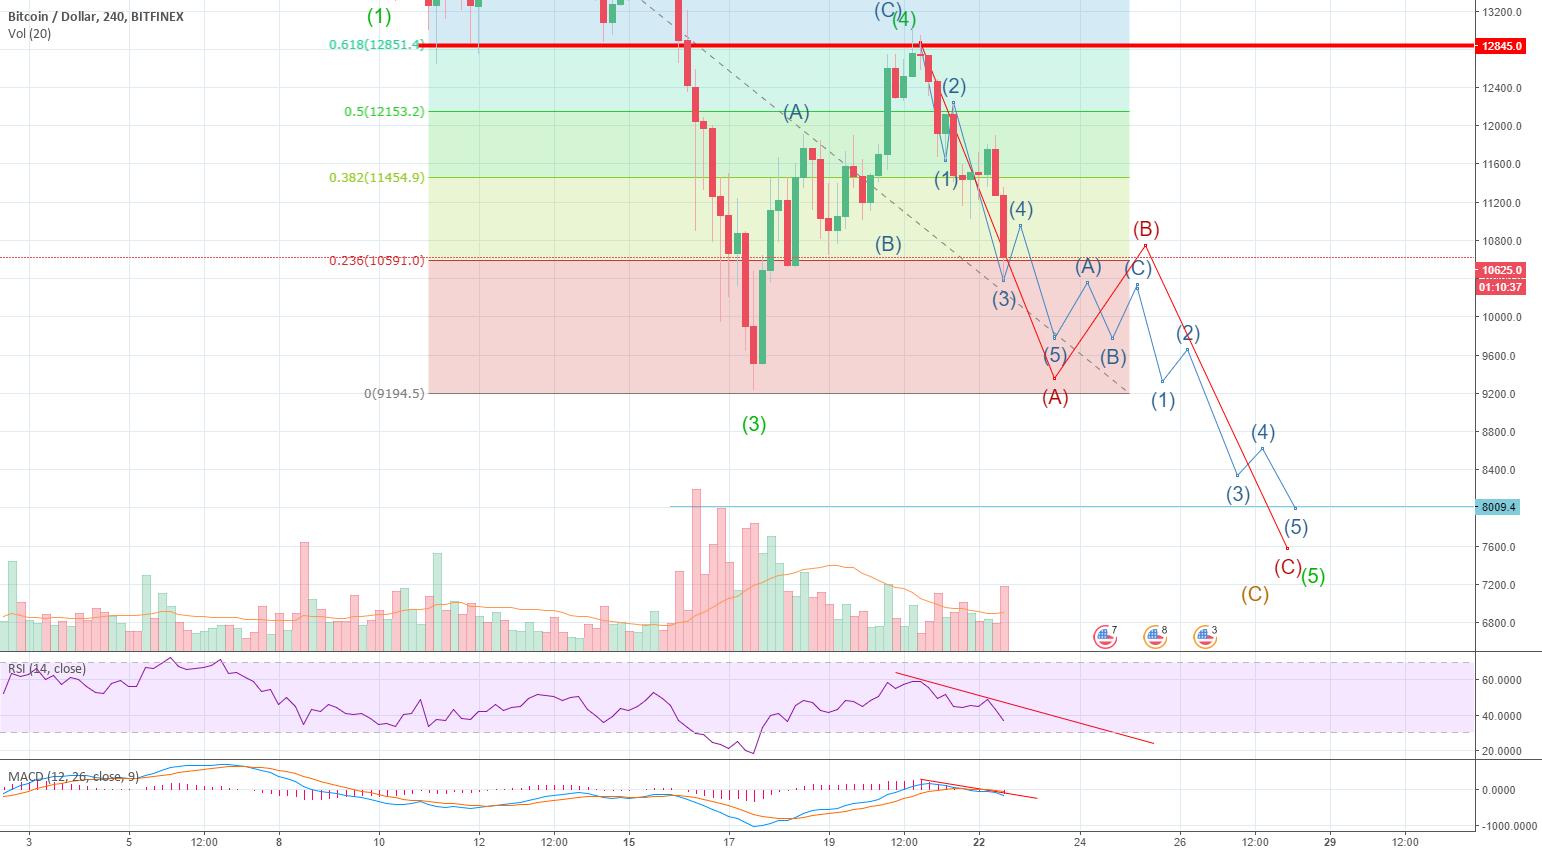 BitCoin breakdown is in progress - Wave 5 has started